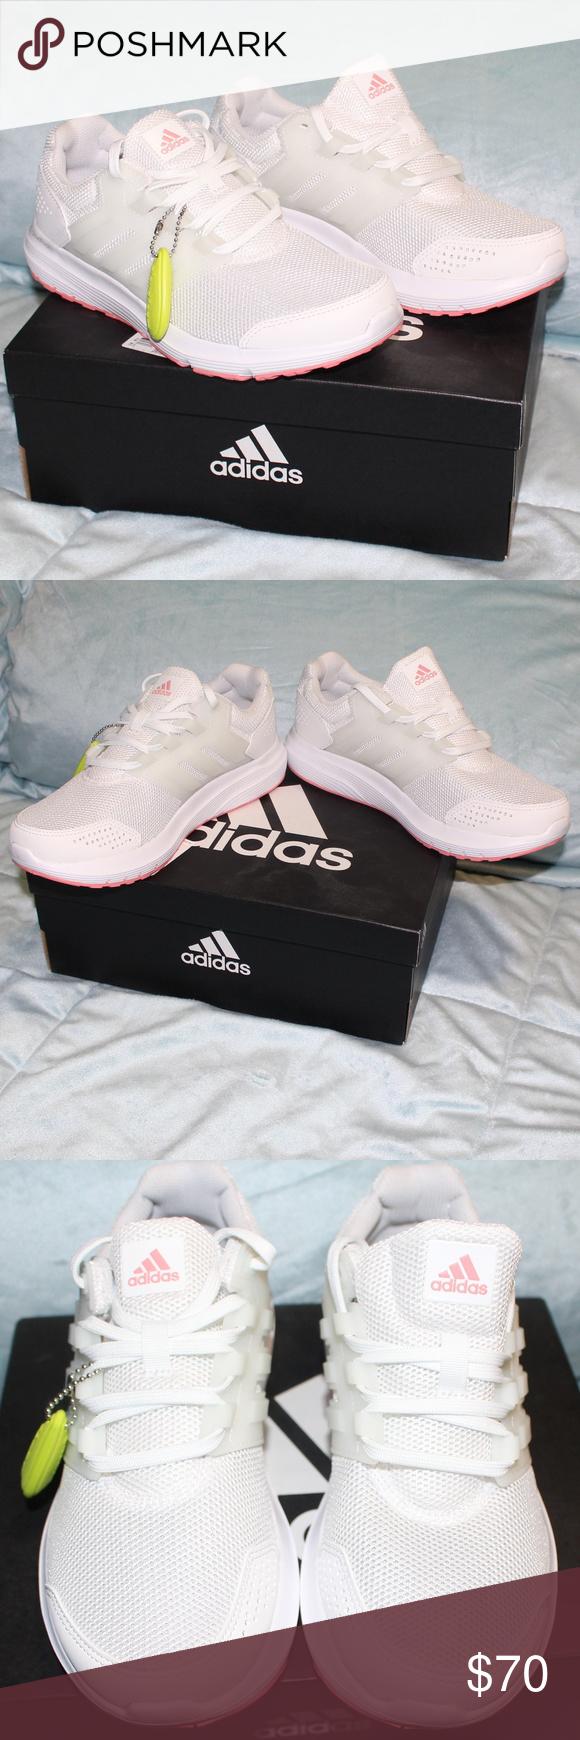 nuove adidas cloudfoam galaxy 4 scarpe da corsa nwt scarpe